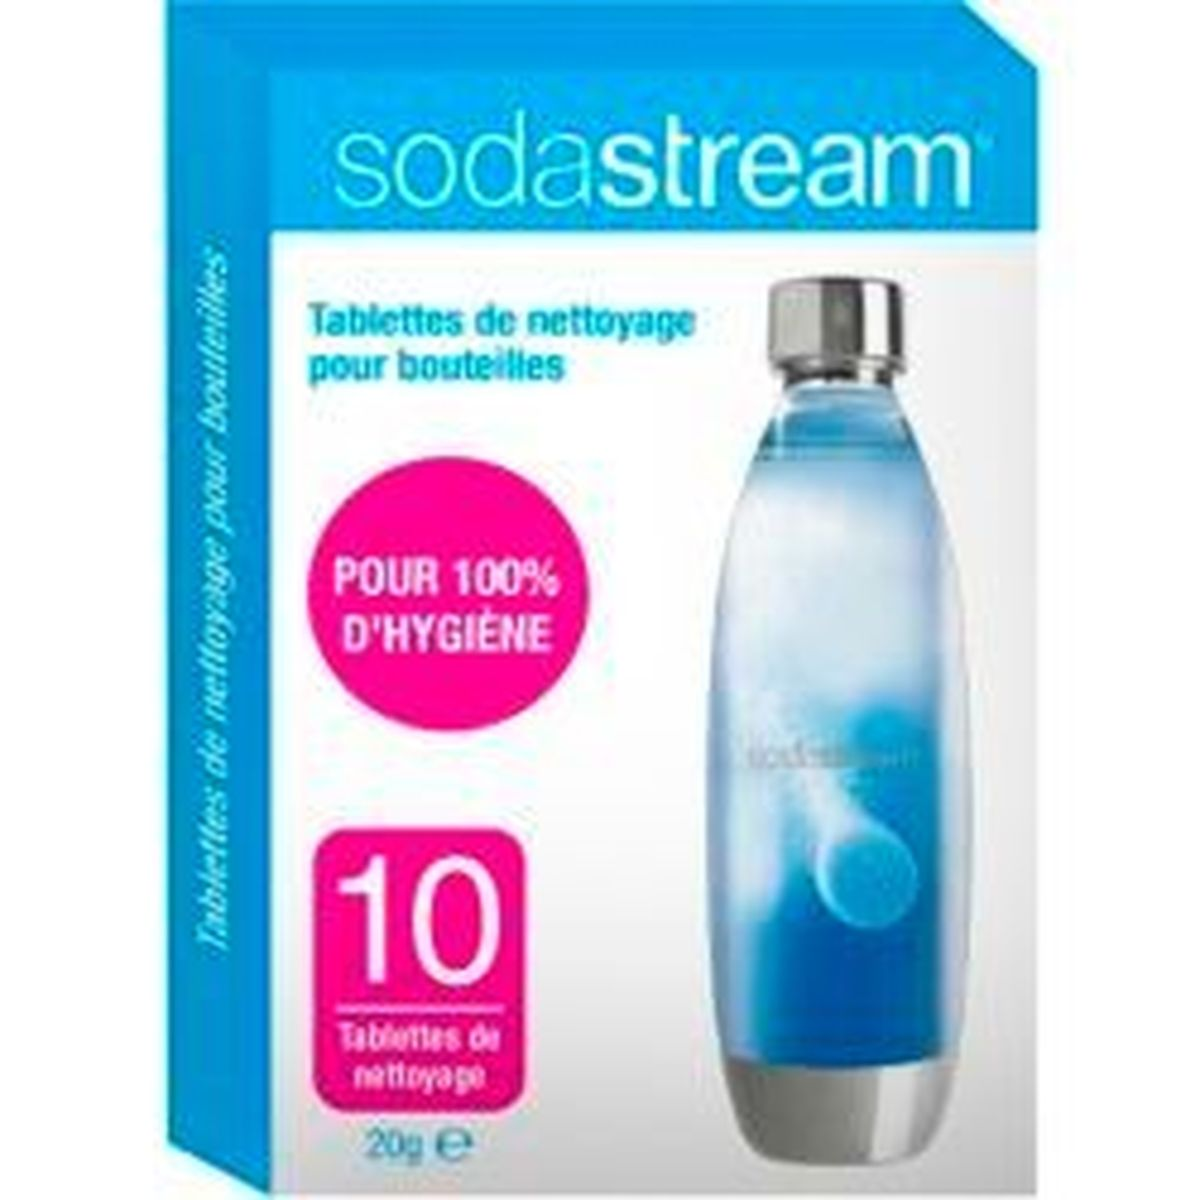 10 tablettes de nettoyage - Sodastream